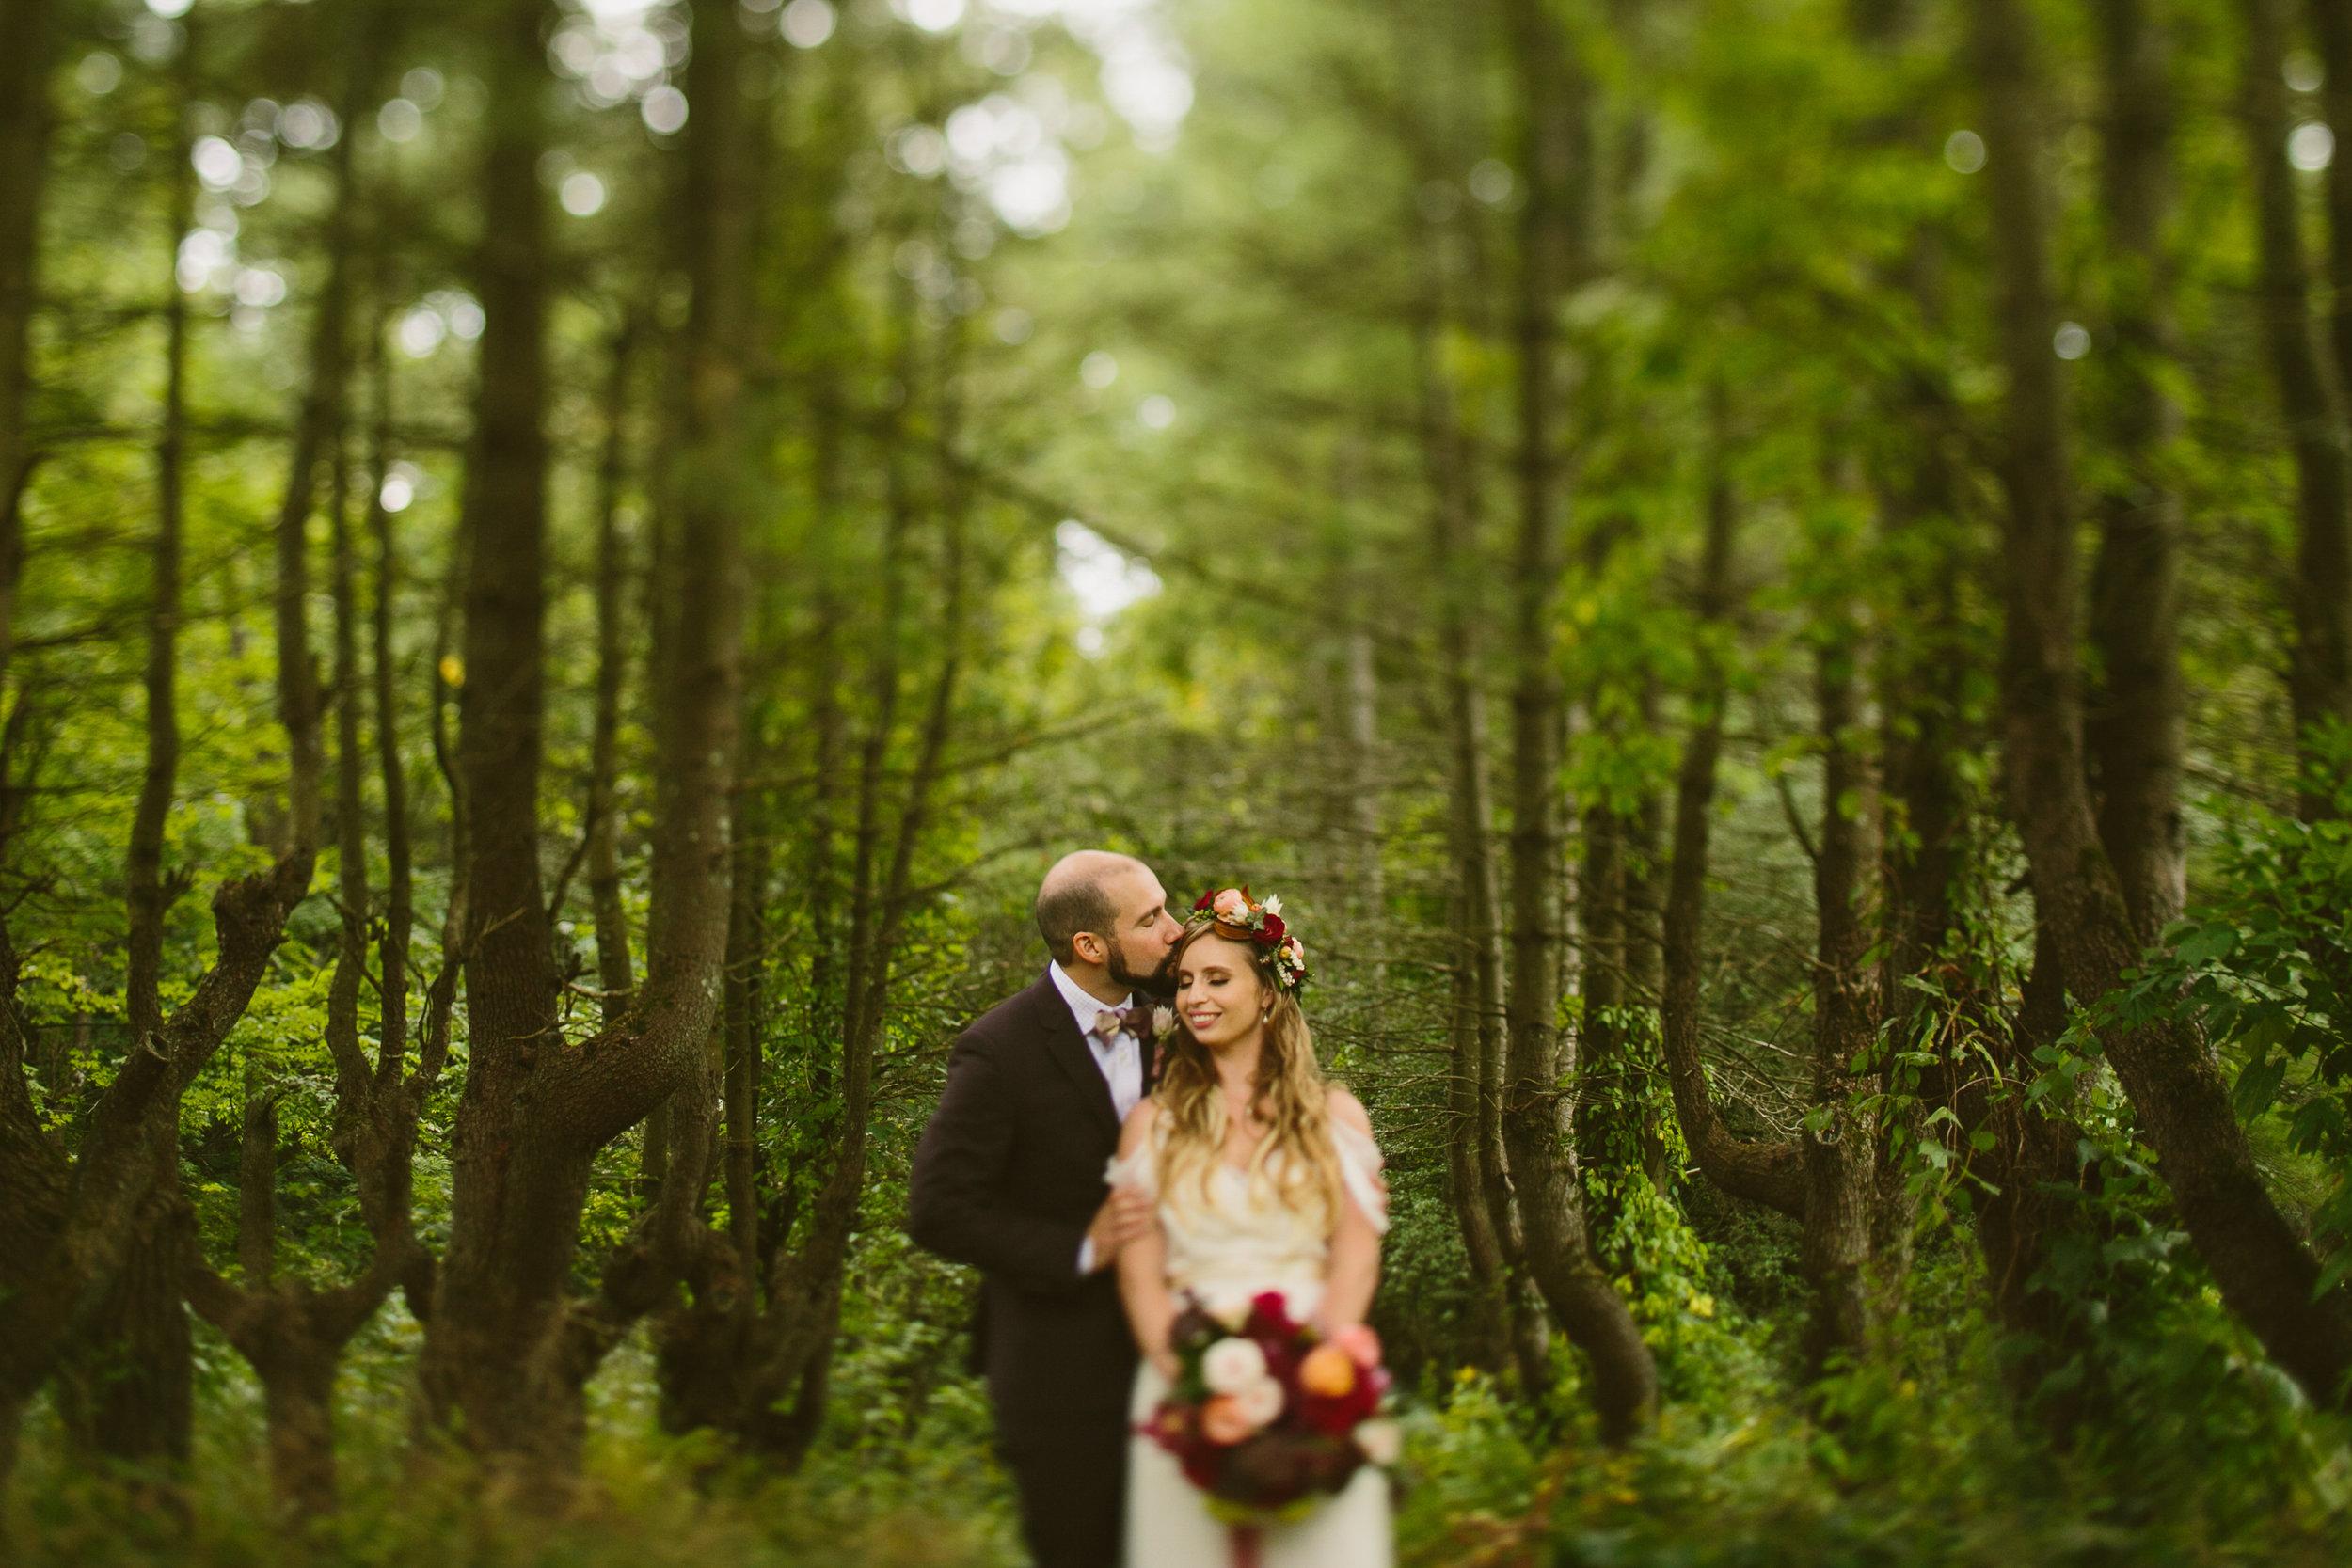 Kristen+Adam-WeddingDay-ForPrint-331-2.jpg